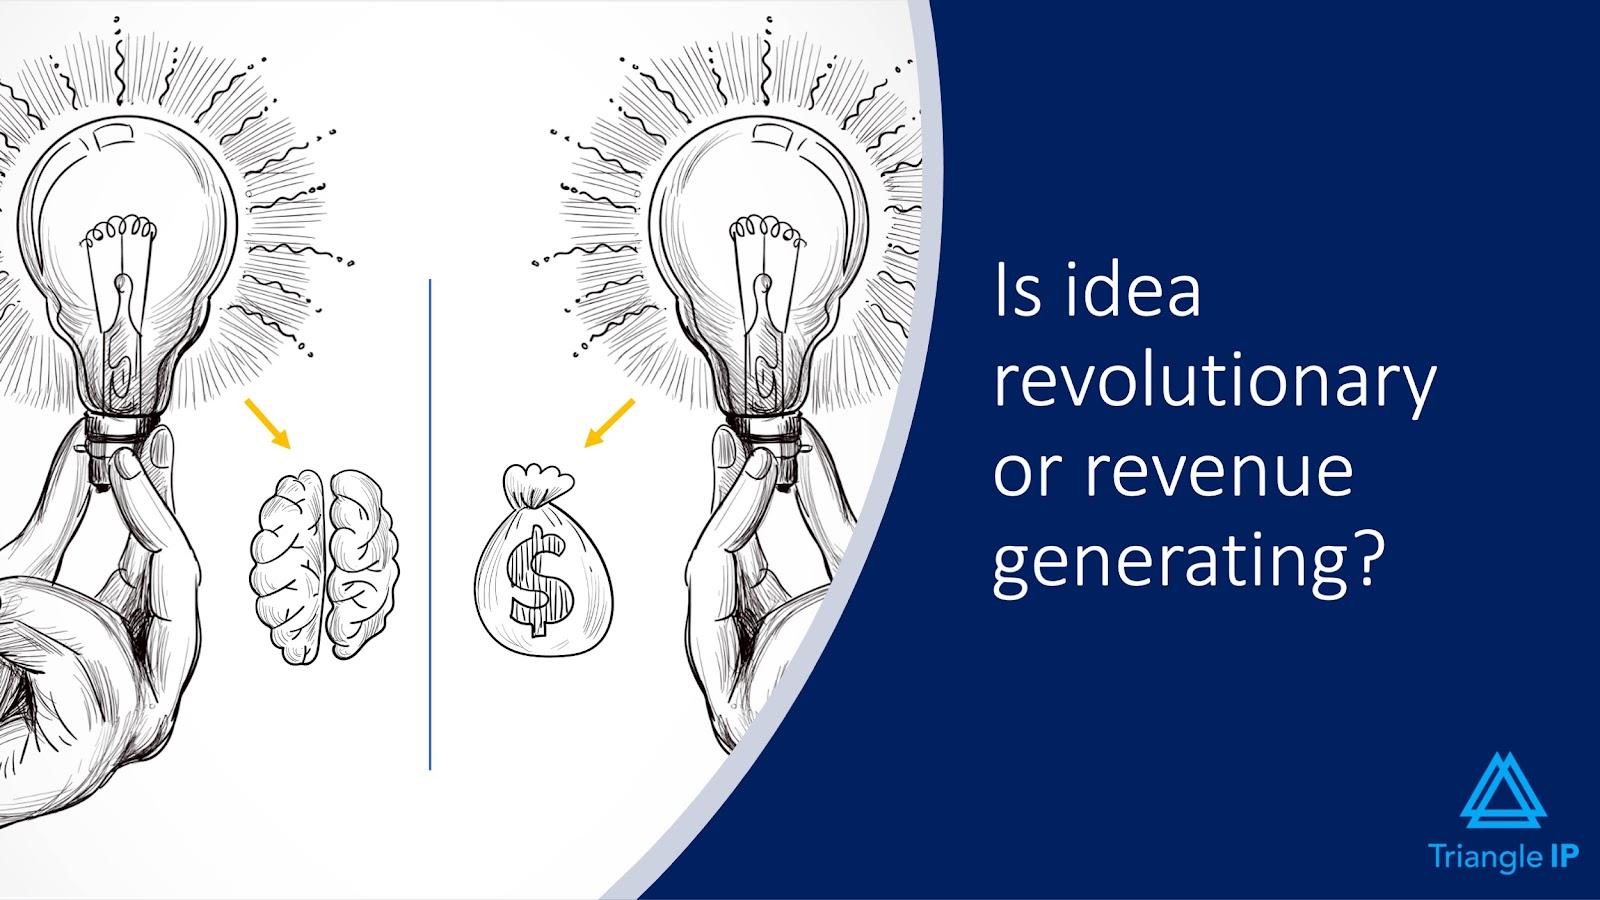 Evaluating Ideas for Patentability | Q2 - Is idea revolutionary or revenue generating?